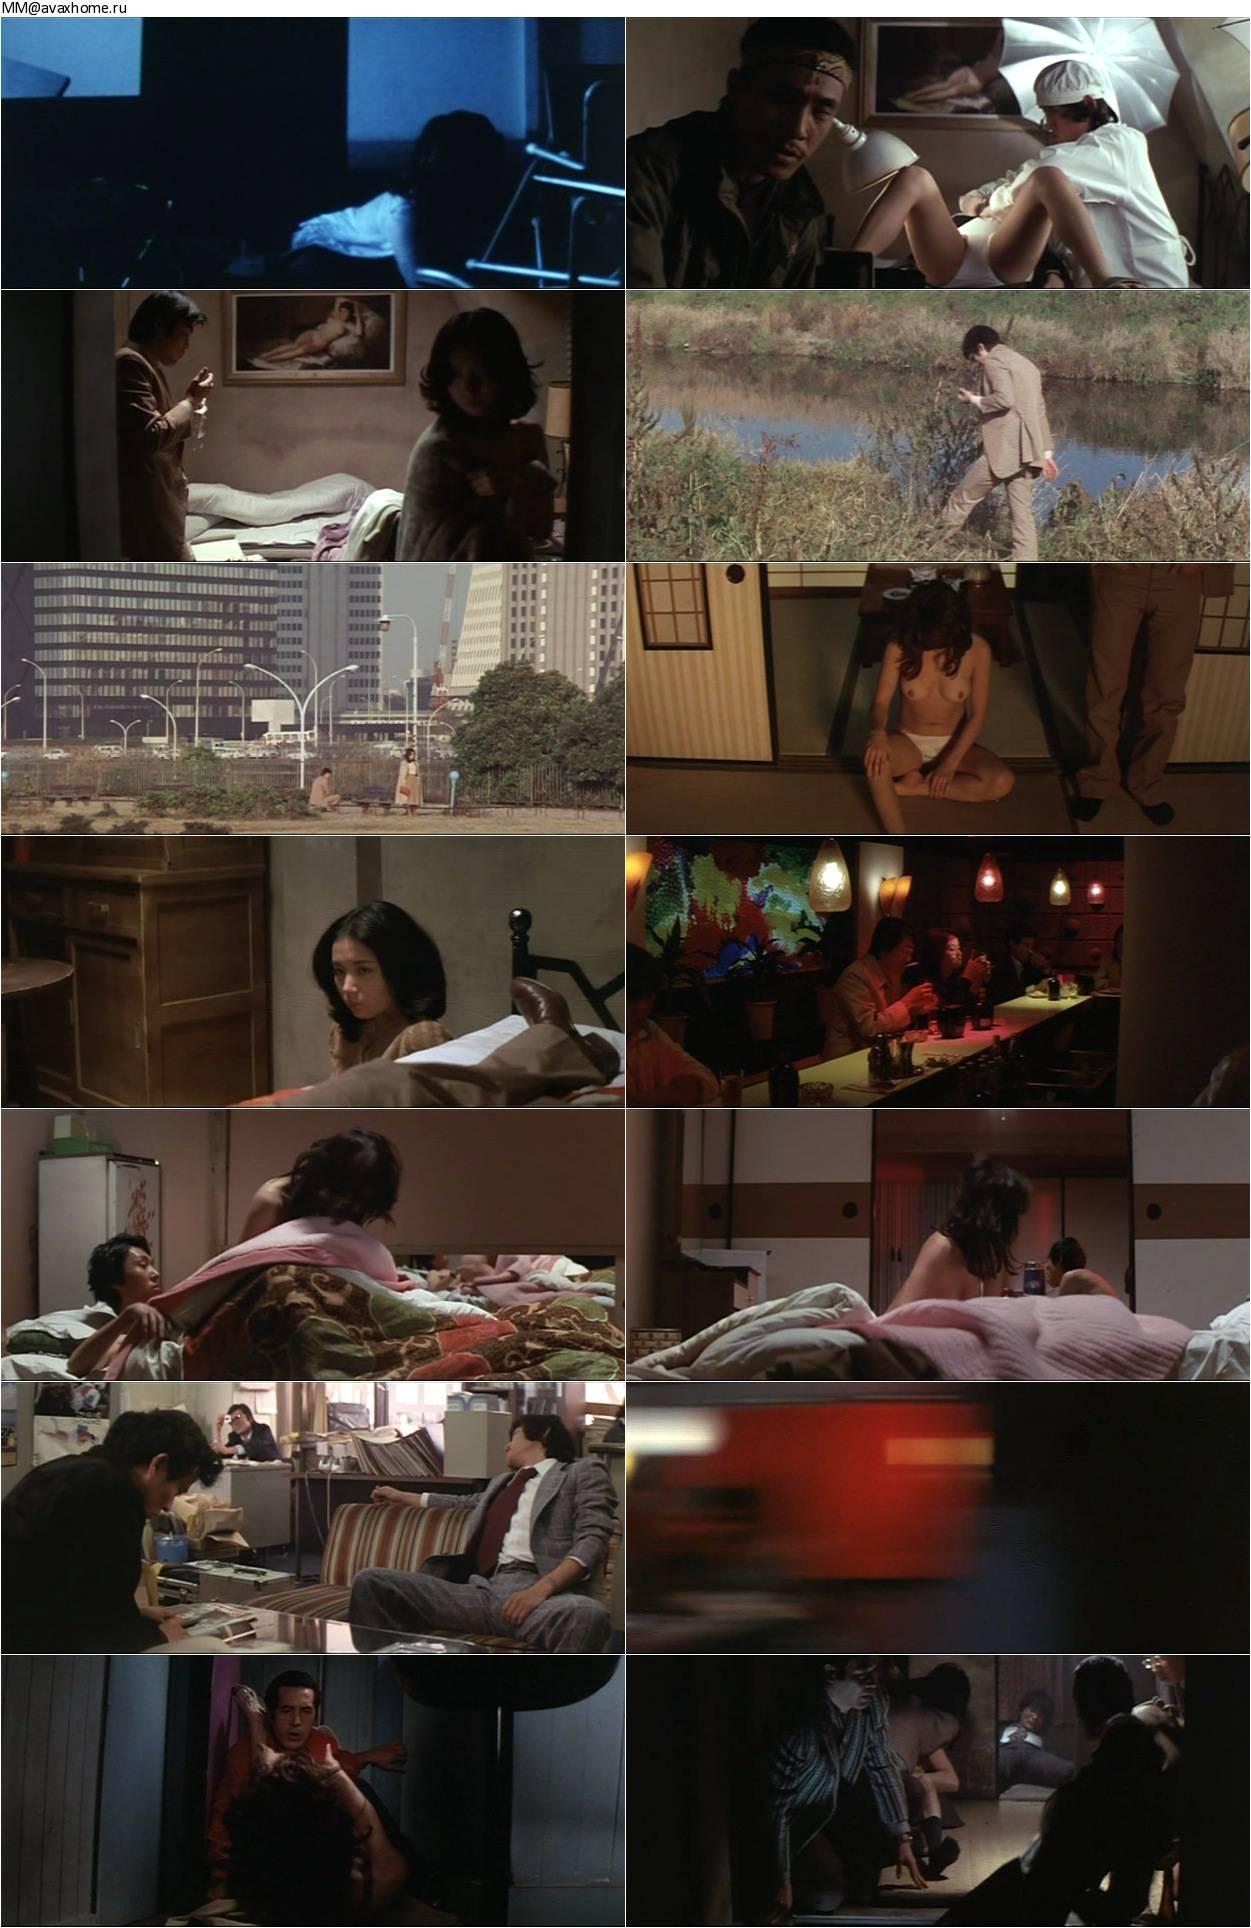 Angel Guts Nami 1979 angel guts: red classroom (1979) tenshi no harawata: akai